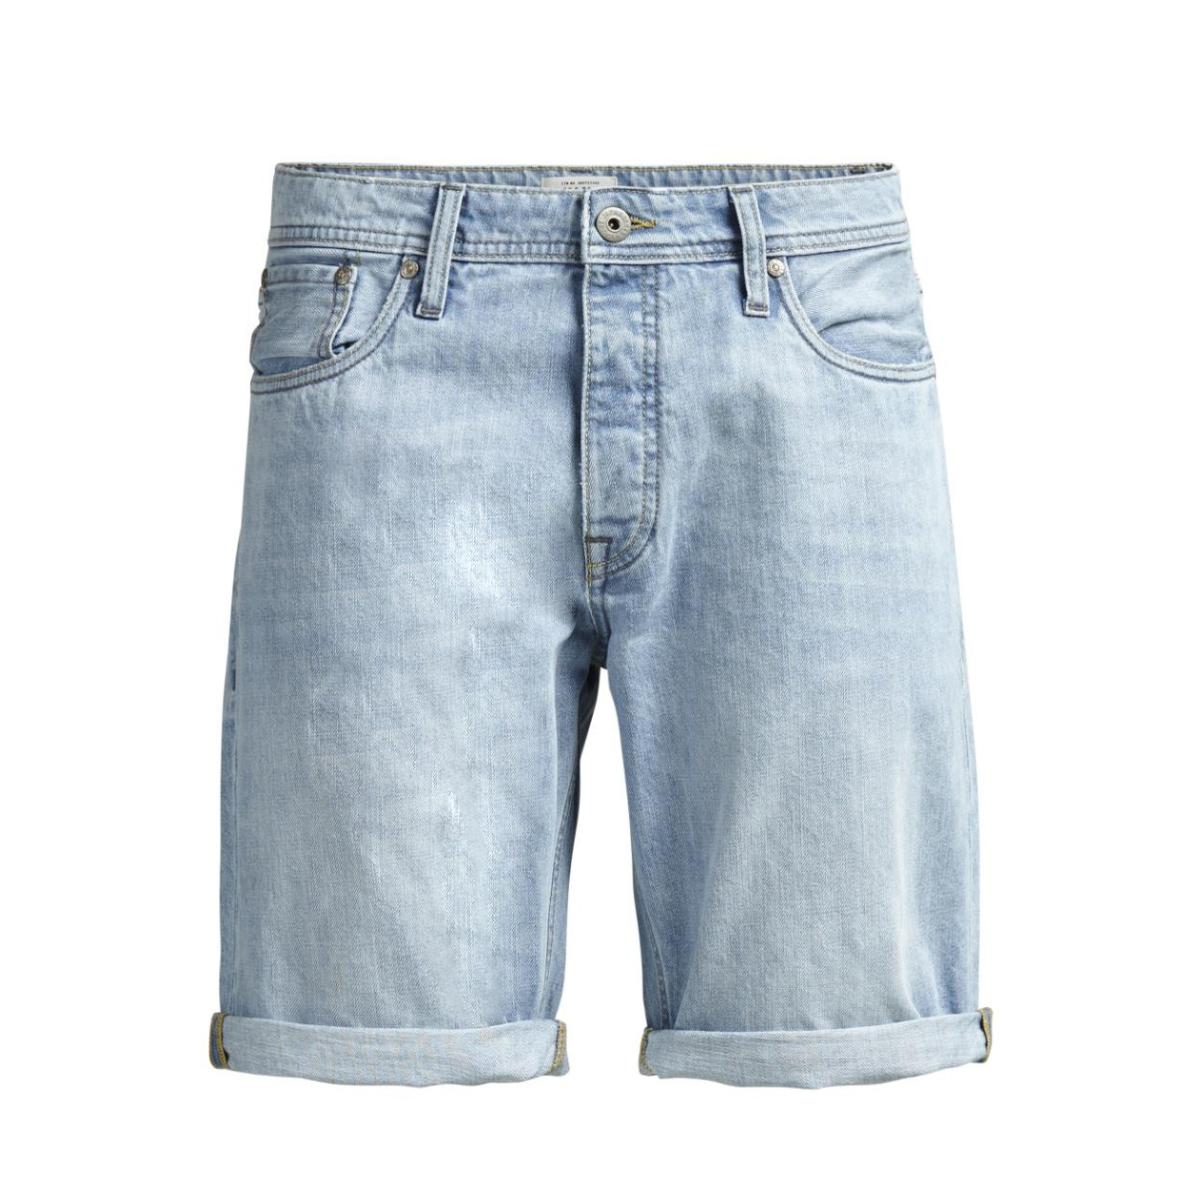 jjirick jjoriginal shorts am 106 st 12116413 jack & jones korte broek blue denim